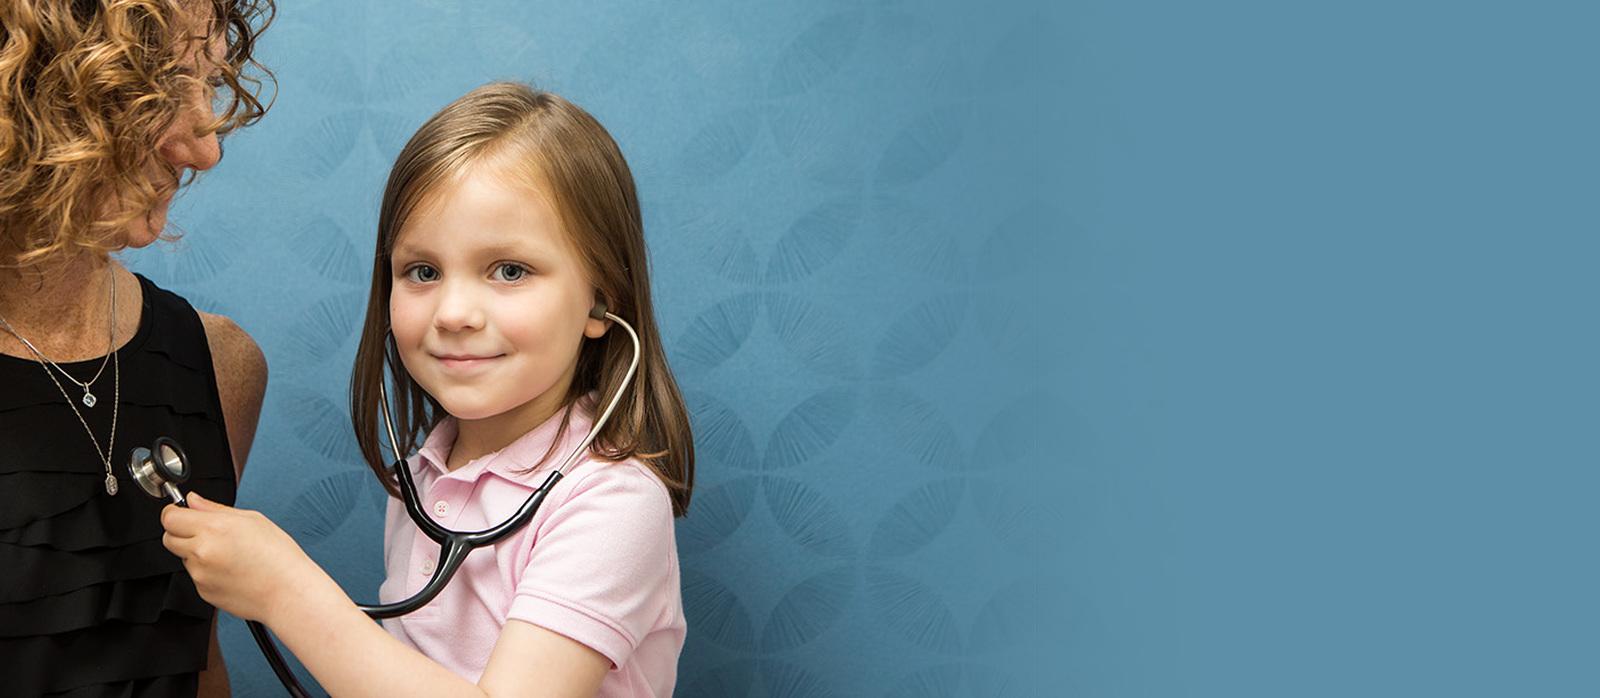 Northwest Pediatrics, Pediatricians in Greensboro NC